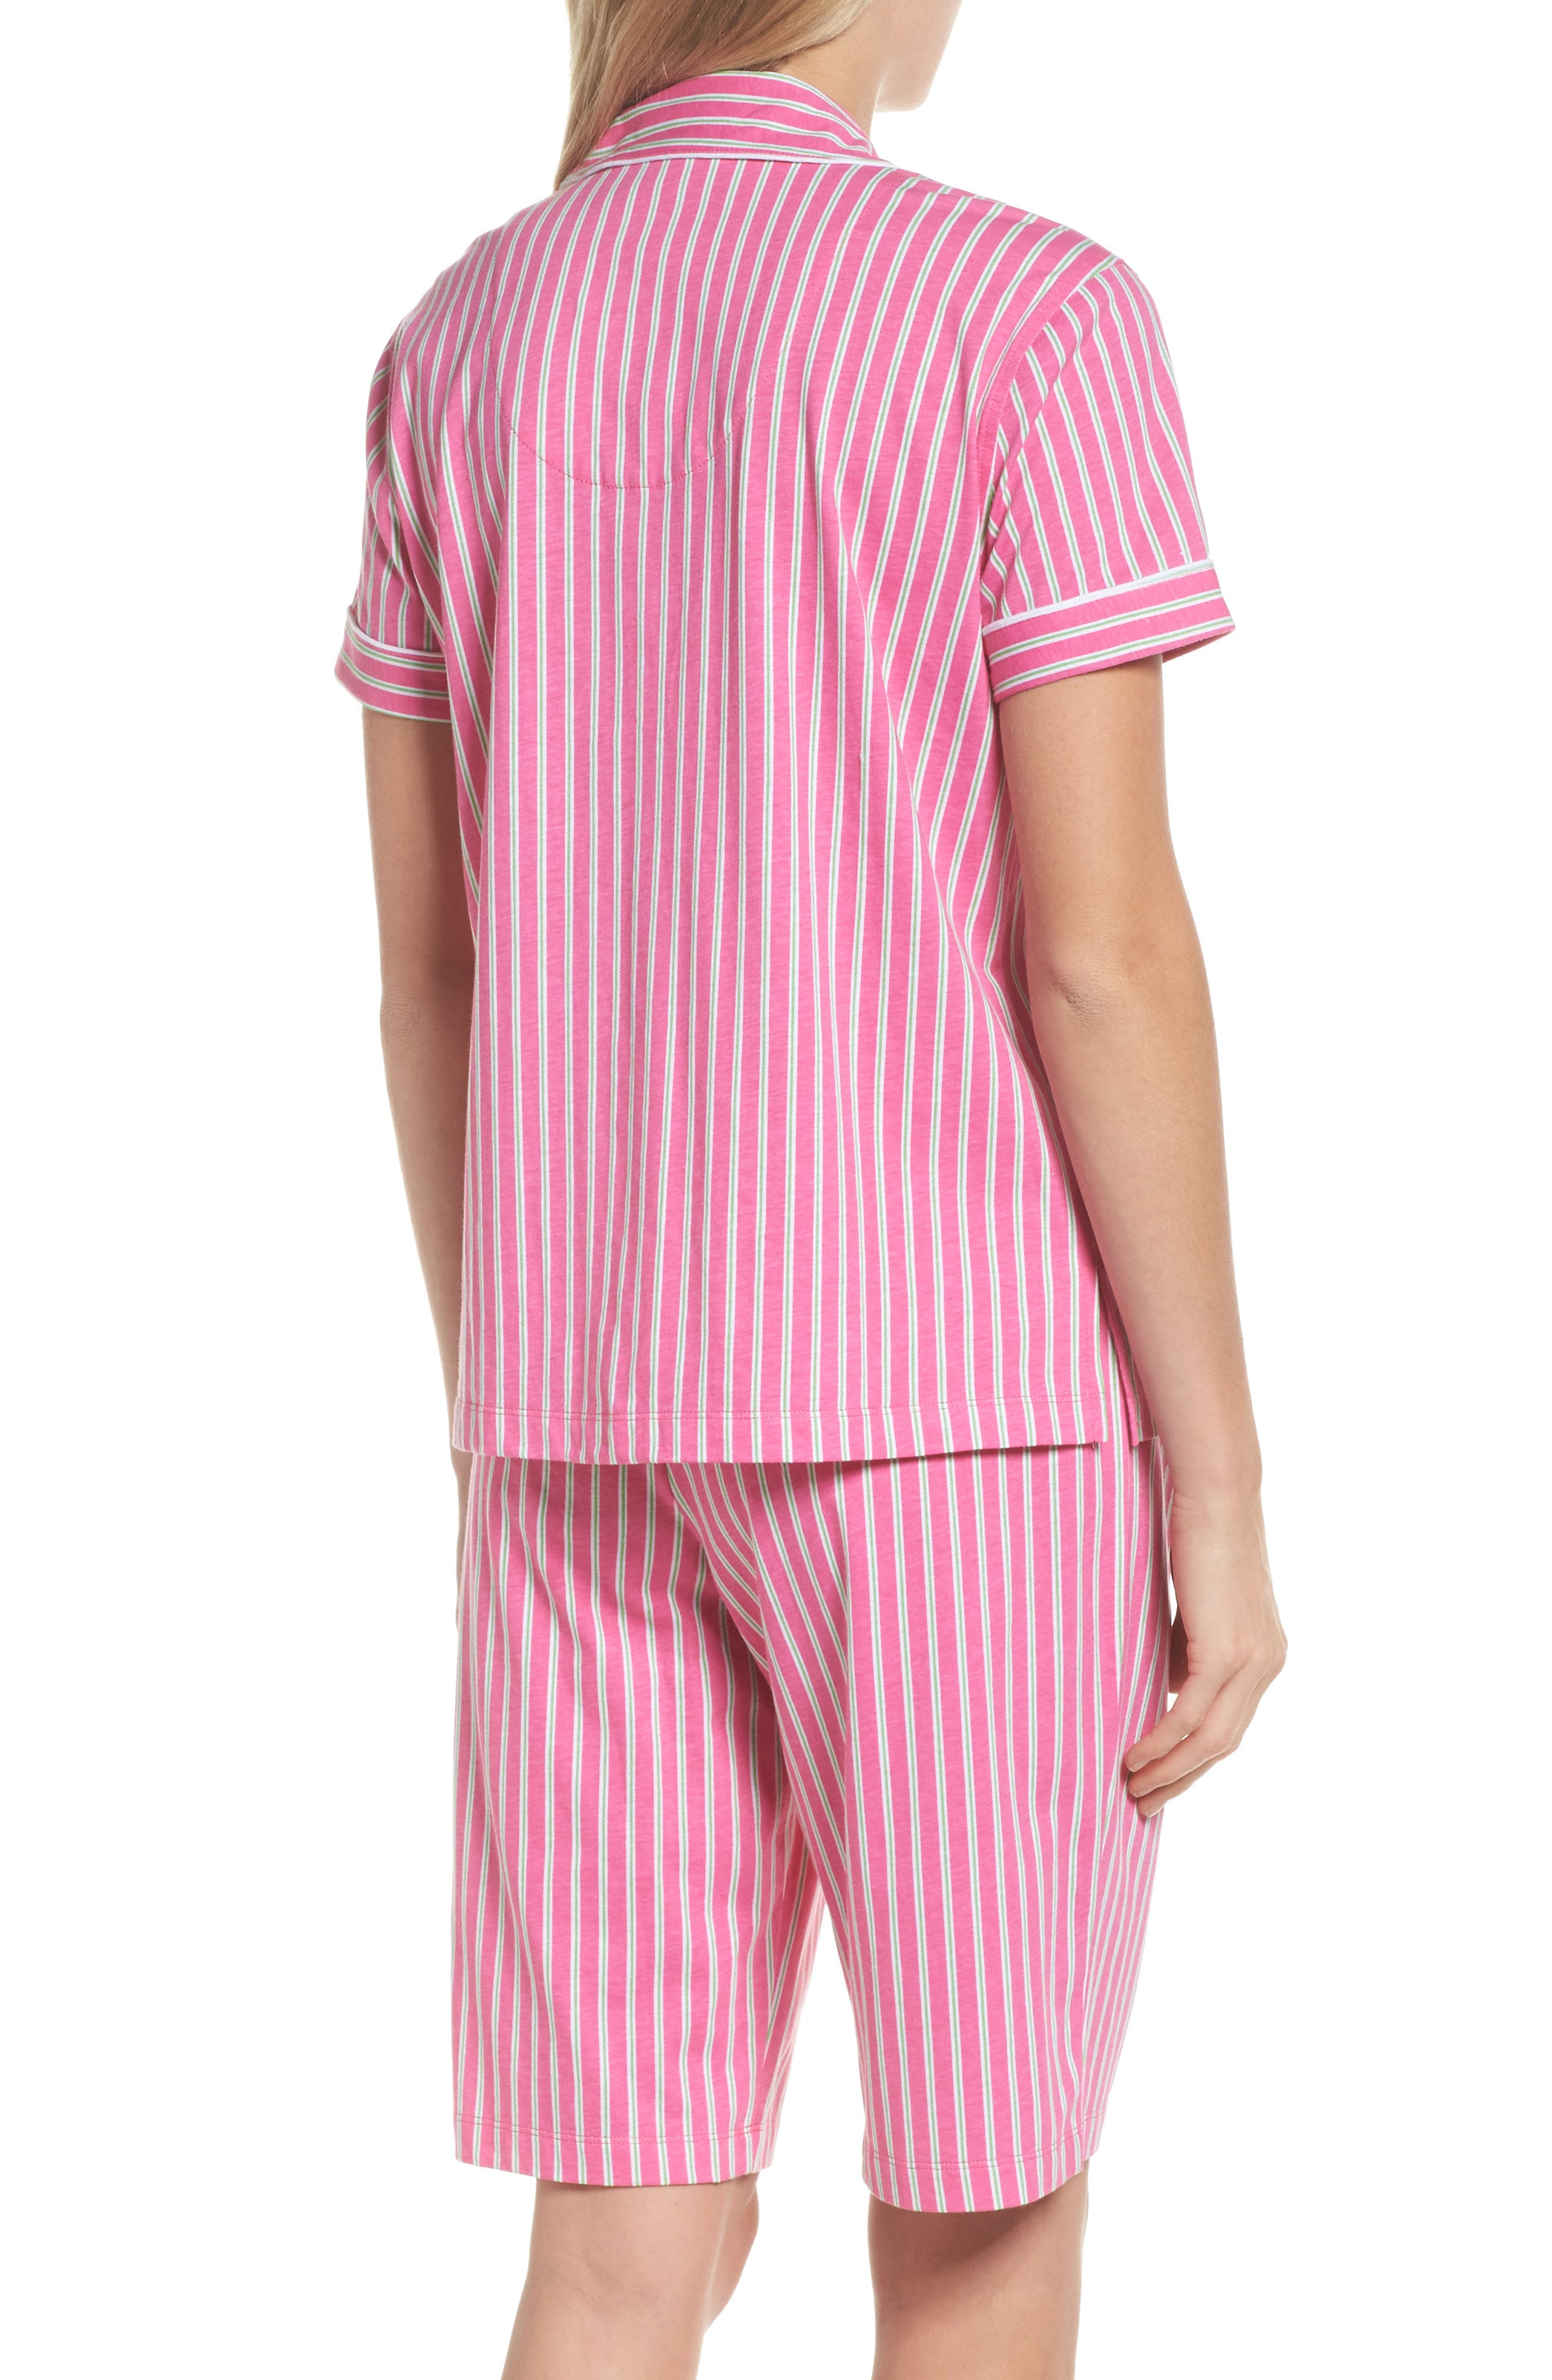 Bermuda Pajamas,                             Alternate thumbnail 3, color,                             674